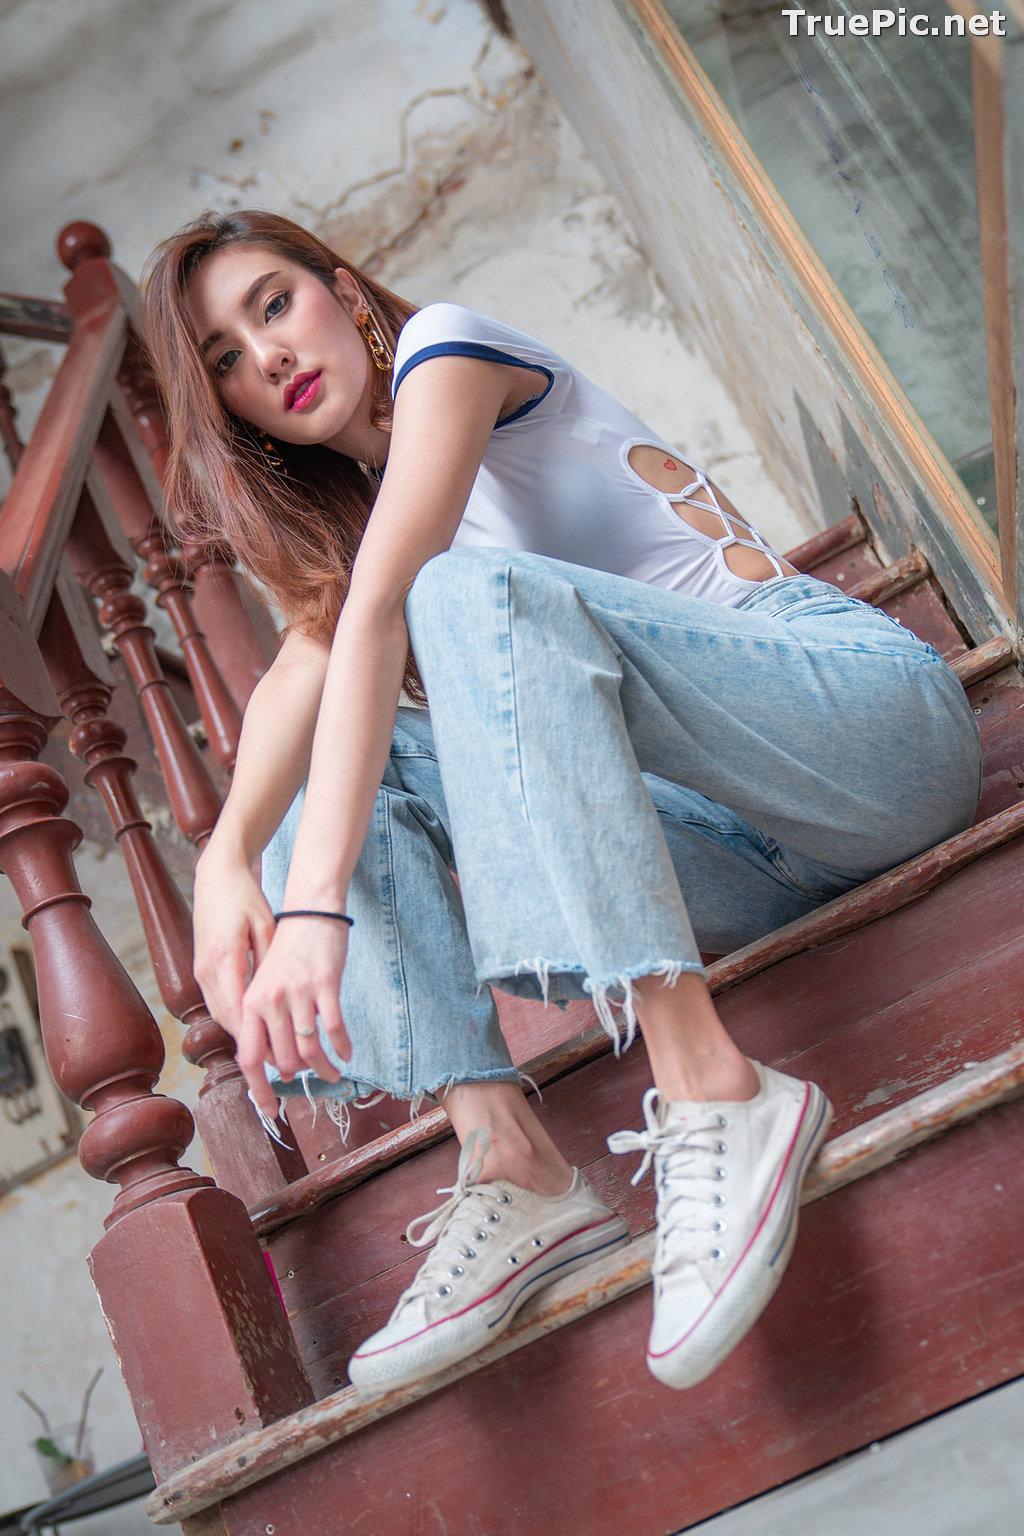 Image Thailand Model - Mynn Sriratampai (Mynn) - Beautiful Picture 2021 Collection - TruePic.net - Picture-46